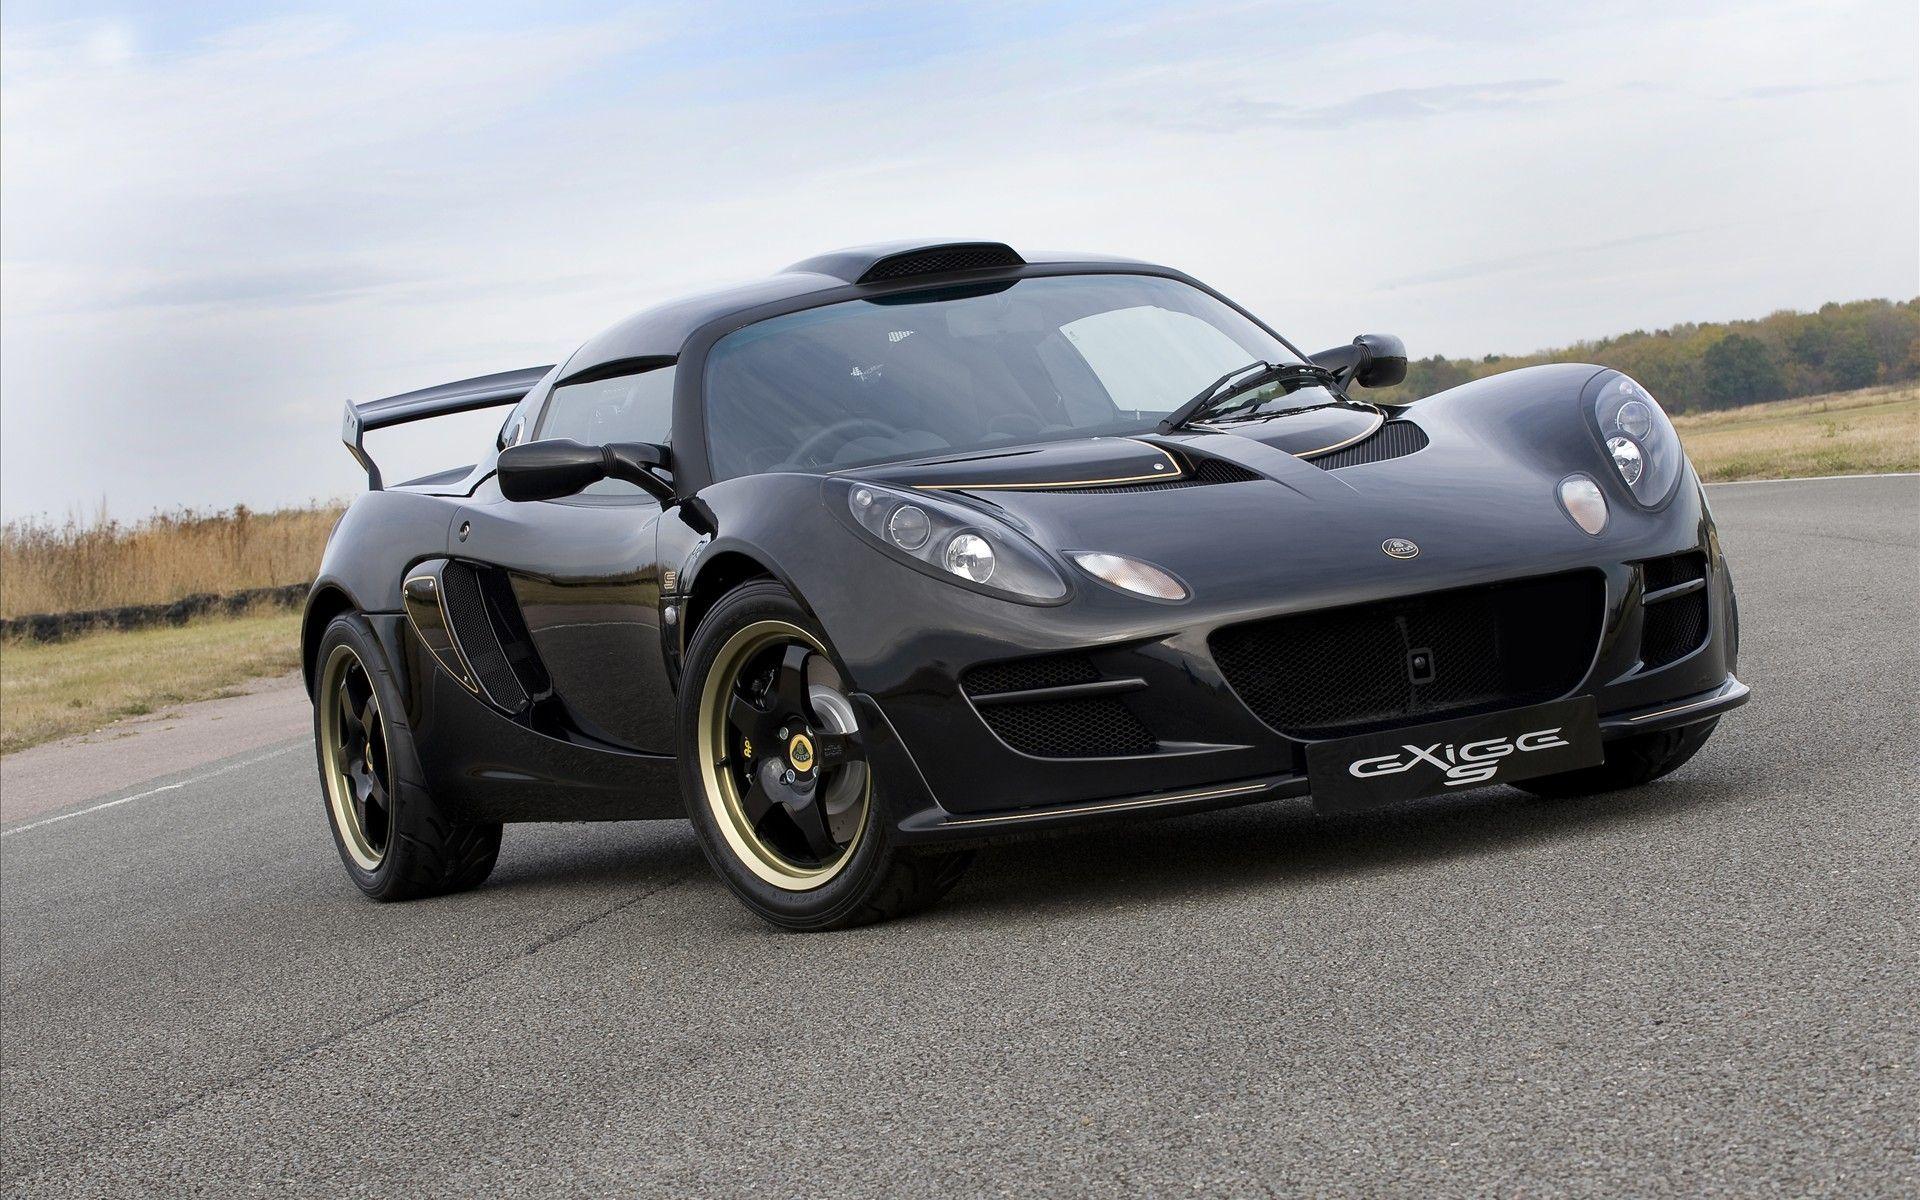 Lotus Exige S With Images Lotus Exige Lotus Car Fast